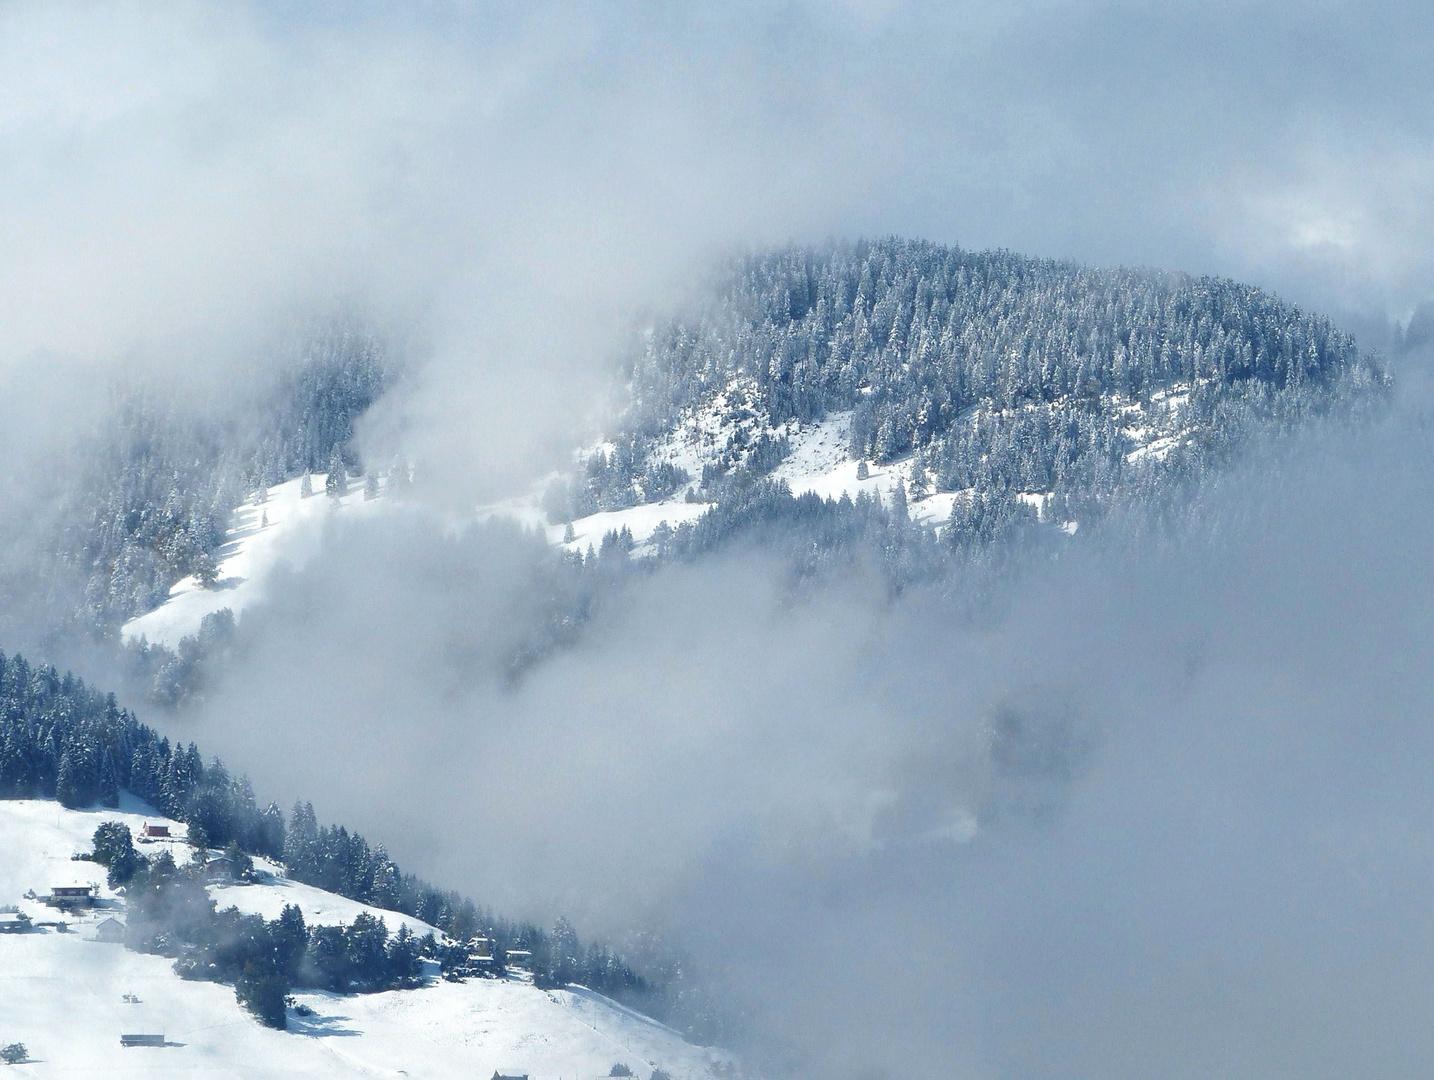 Erster Schnee - Überraschung hinter dem Nebelschleier